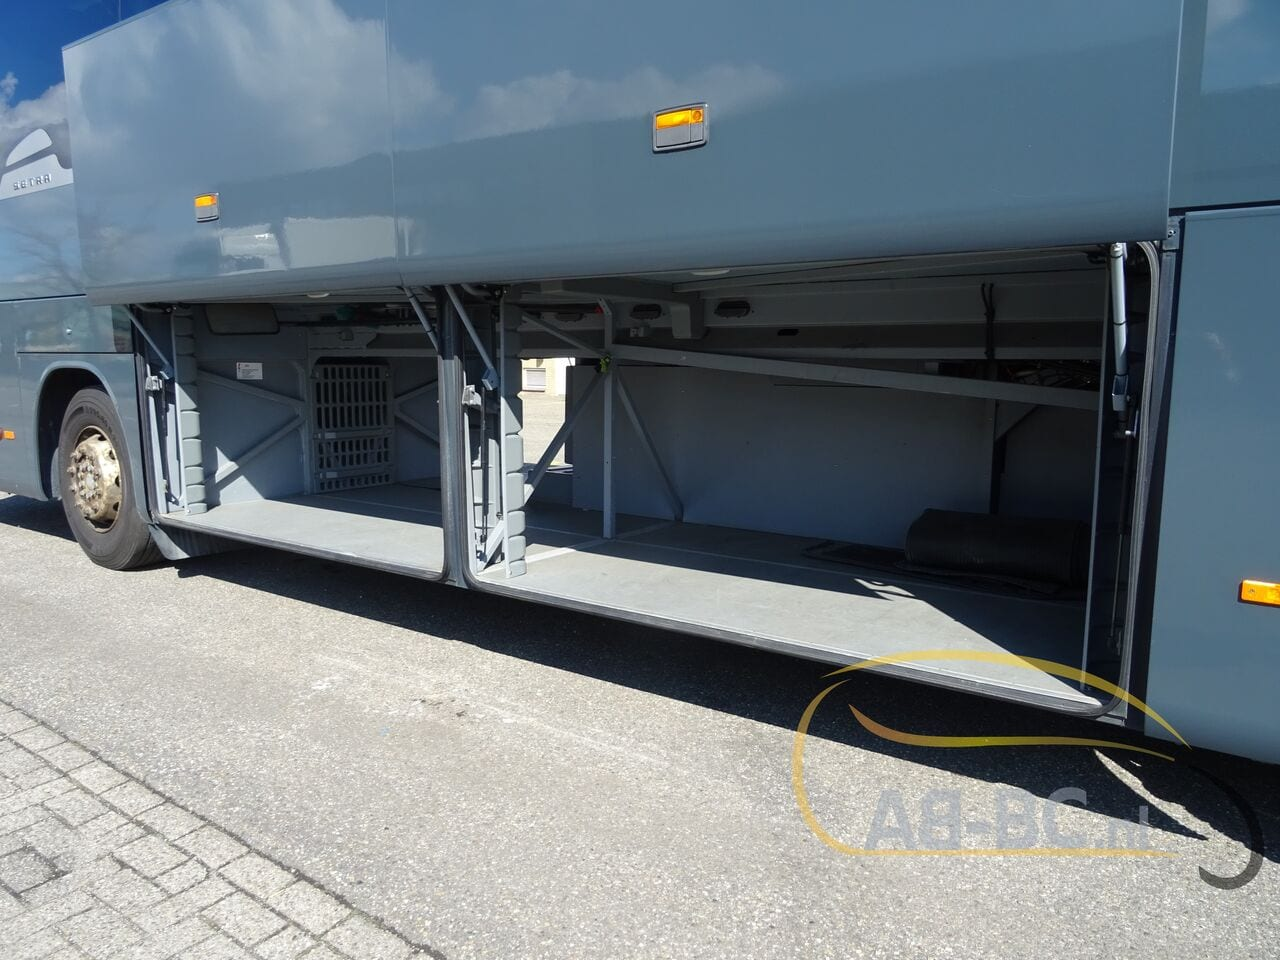 coach-busSETRA-S415-GT-HD-FINAL-EDITION-51-SEATS-LIFTBUS---1620381753181788892_big_b4dd08157bd1c41e35f8c3e70618680a--21050713010665719300